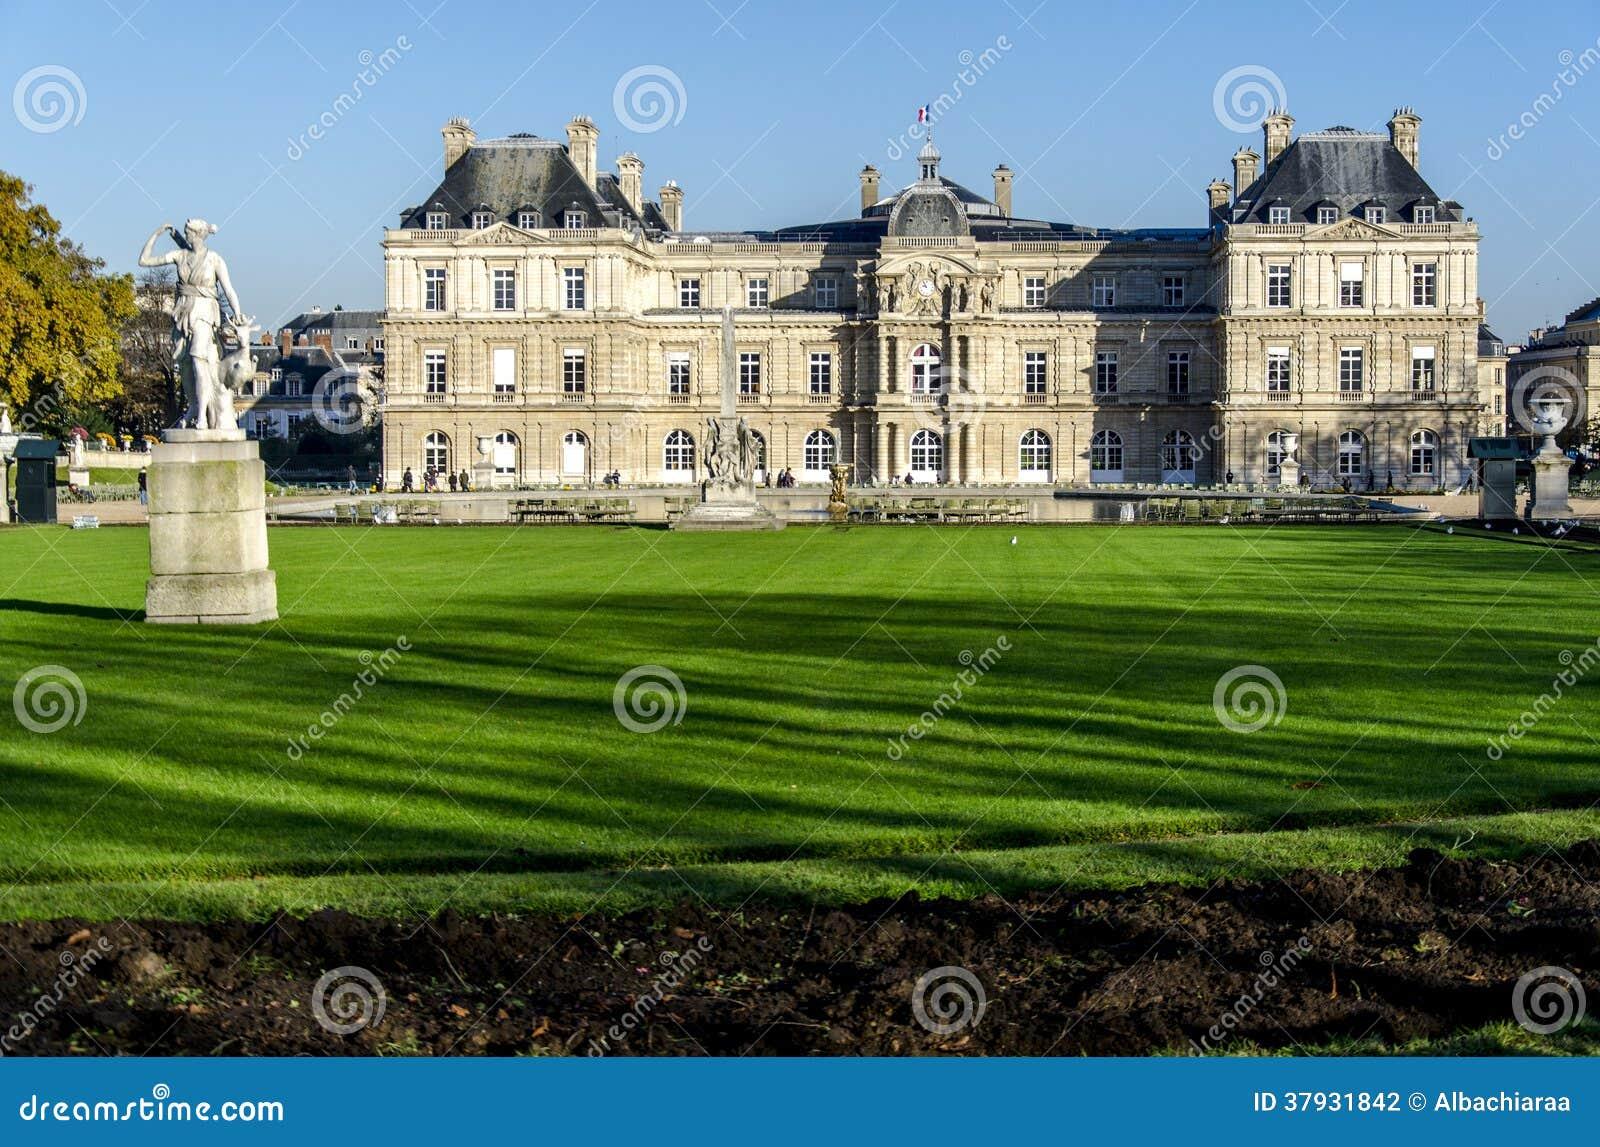 Palais du Люксембург. Париж. Франция.